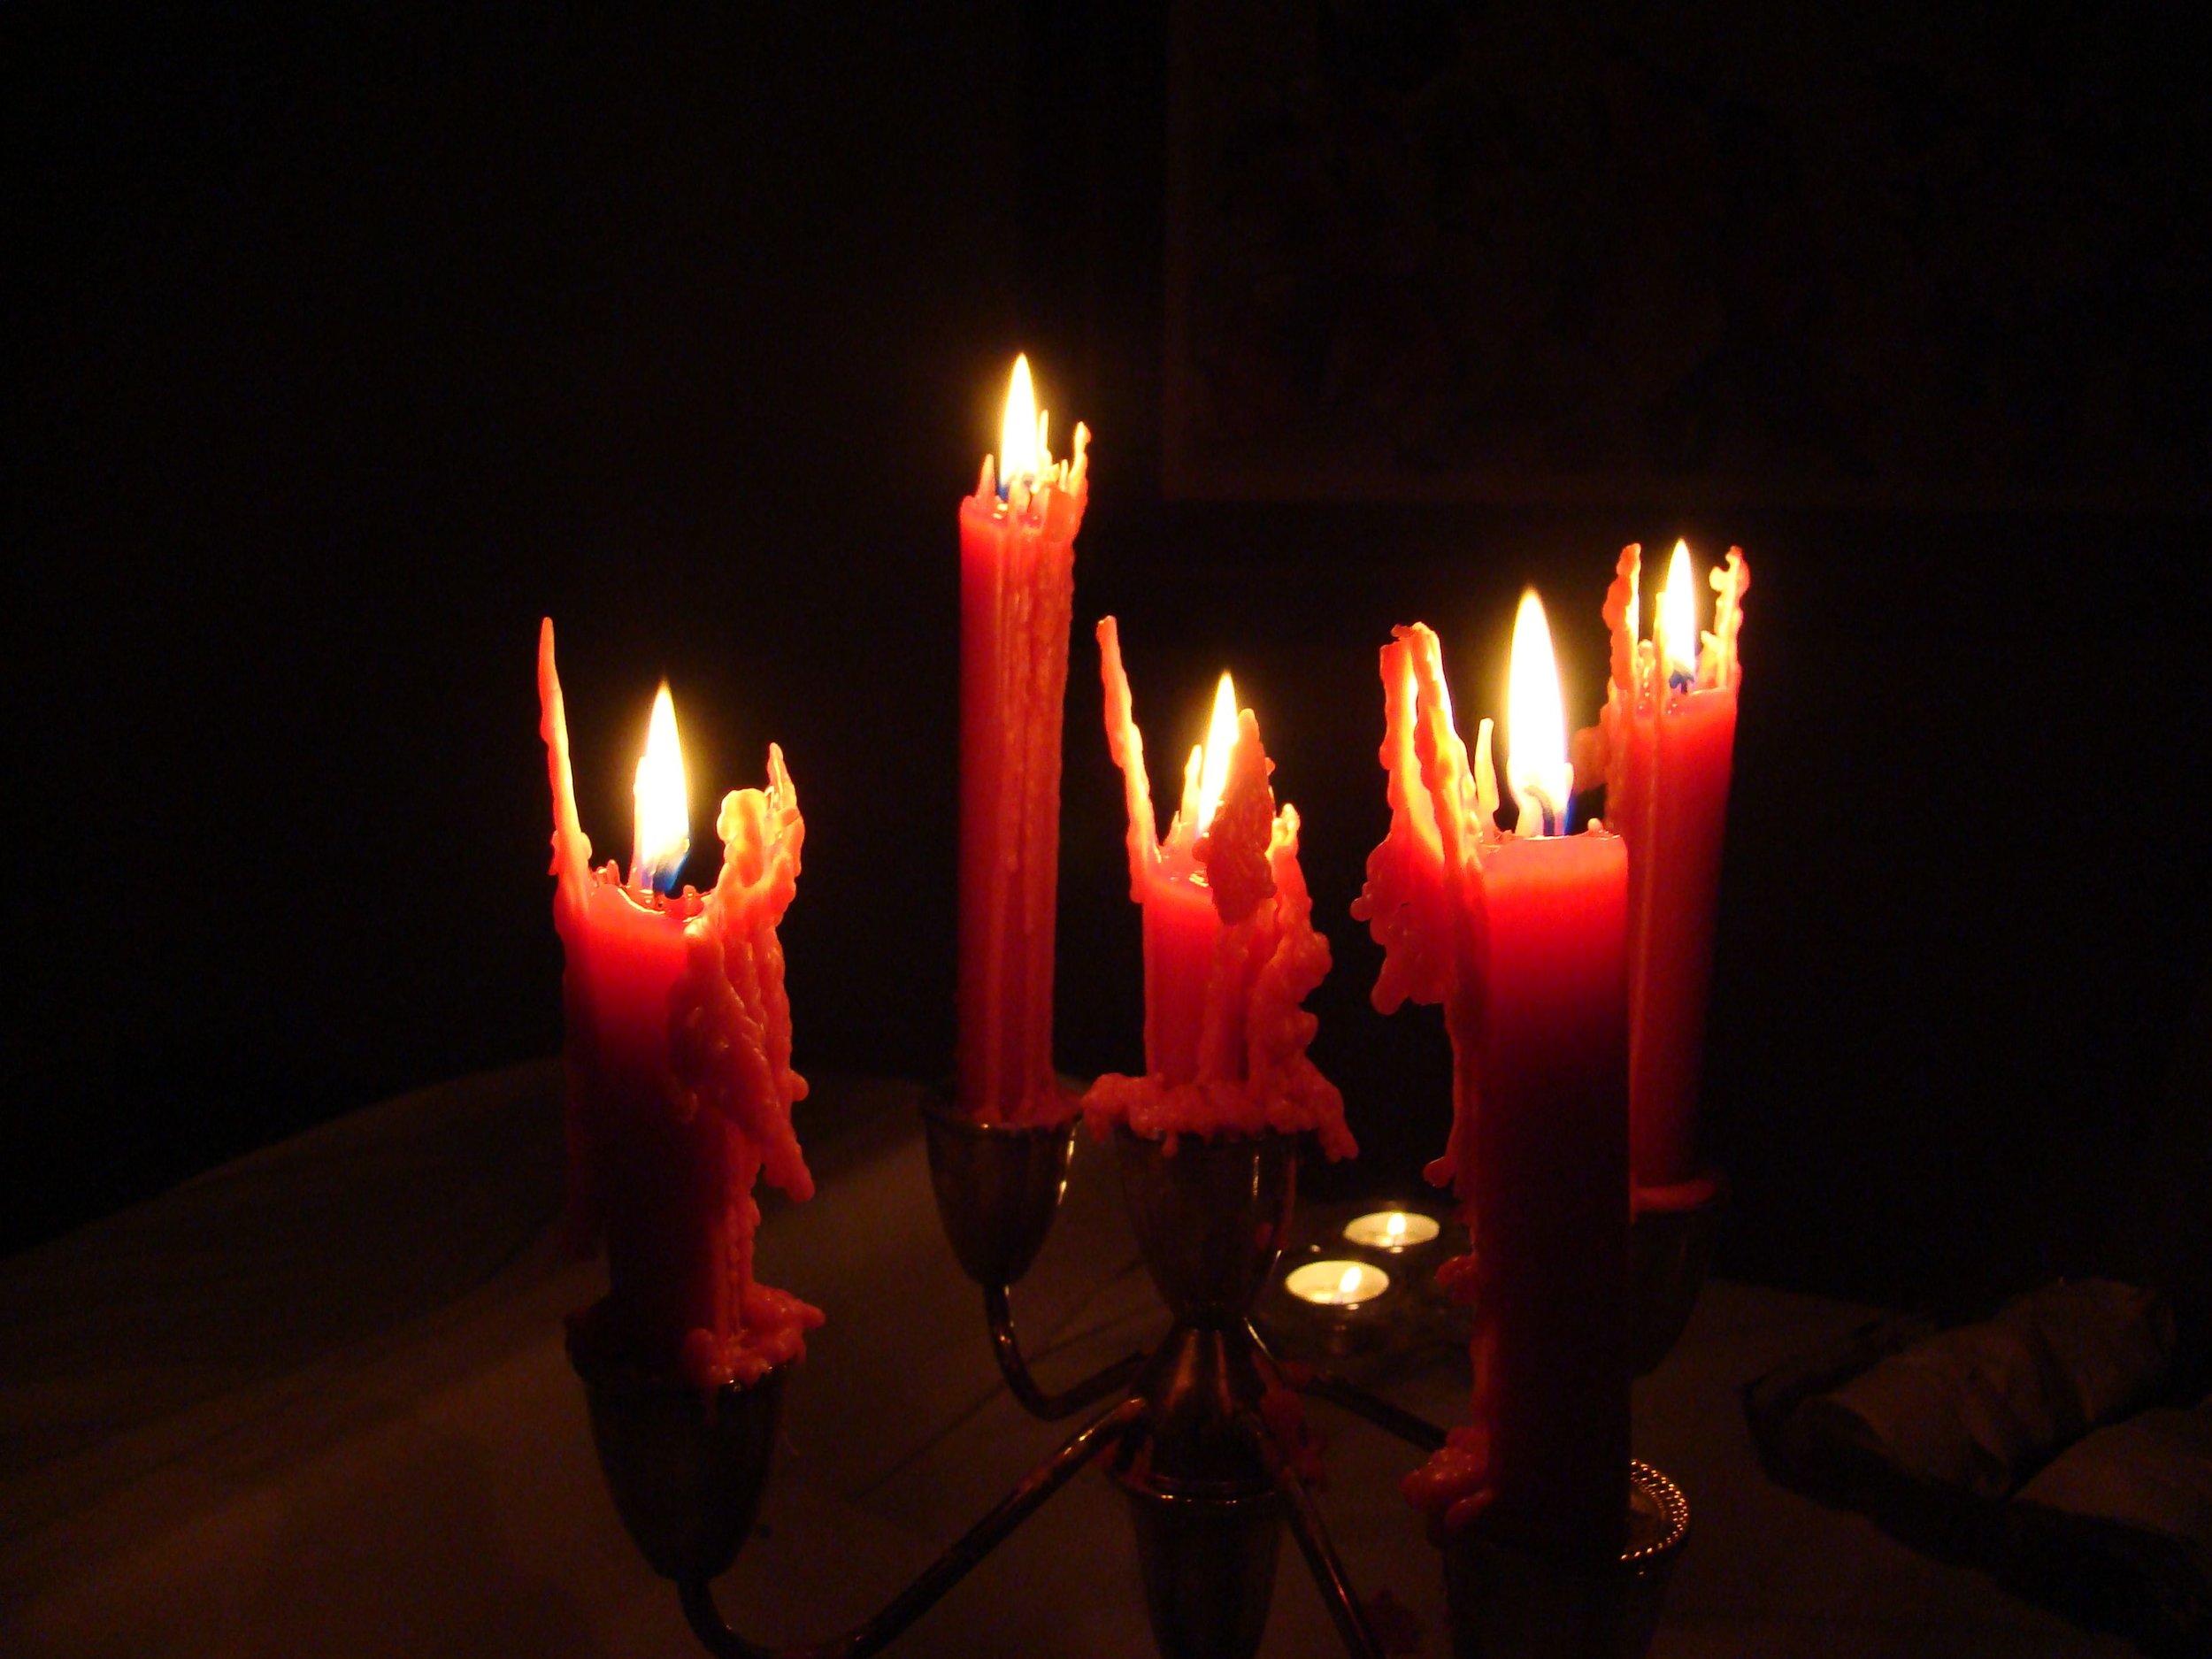 Spooky_halloween_candles_in_dark.jpg